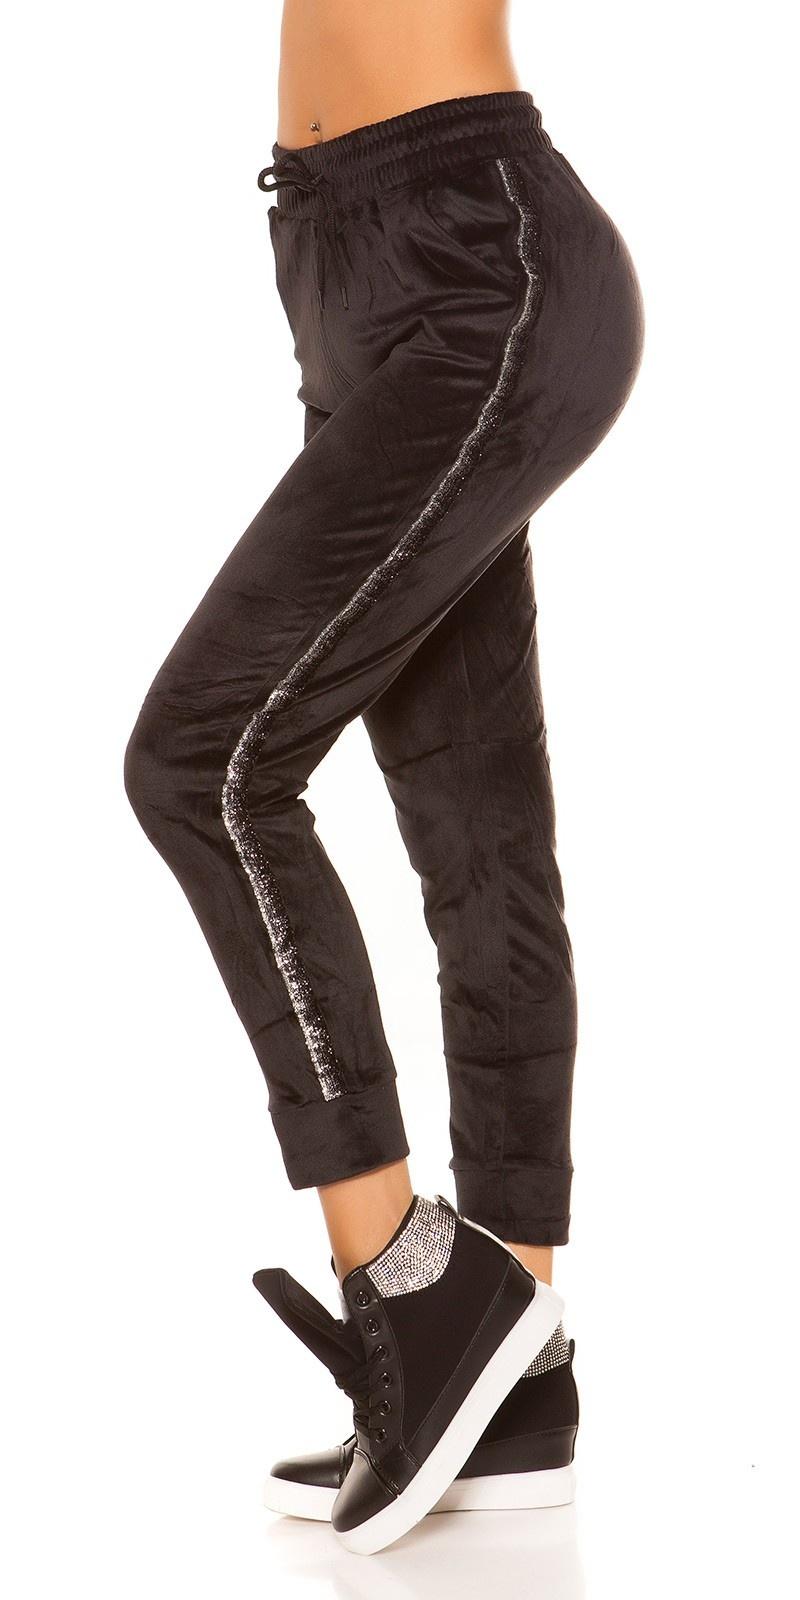 Trendy nicki workout-sport broek met glitter afwerking zwart